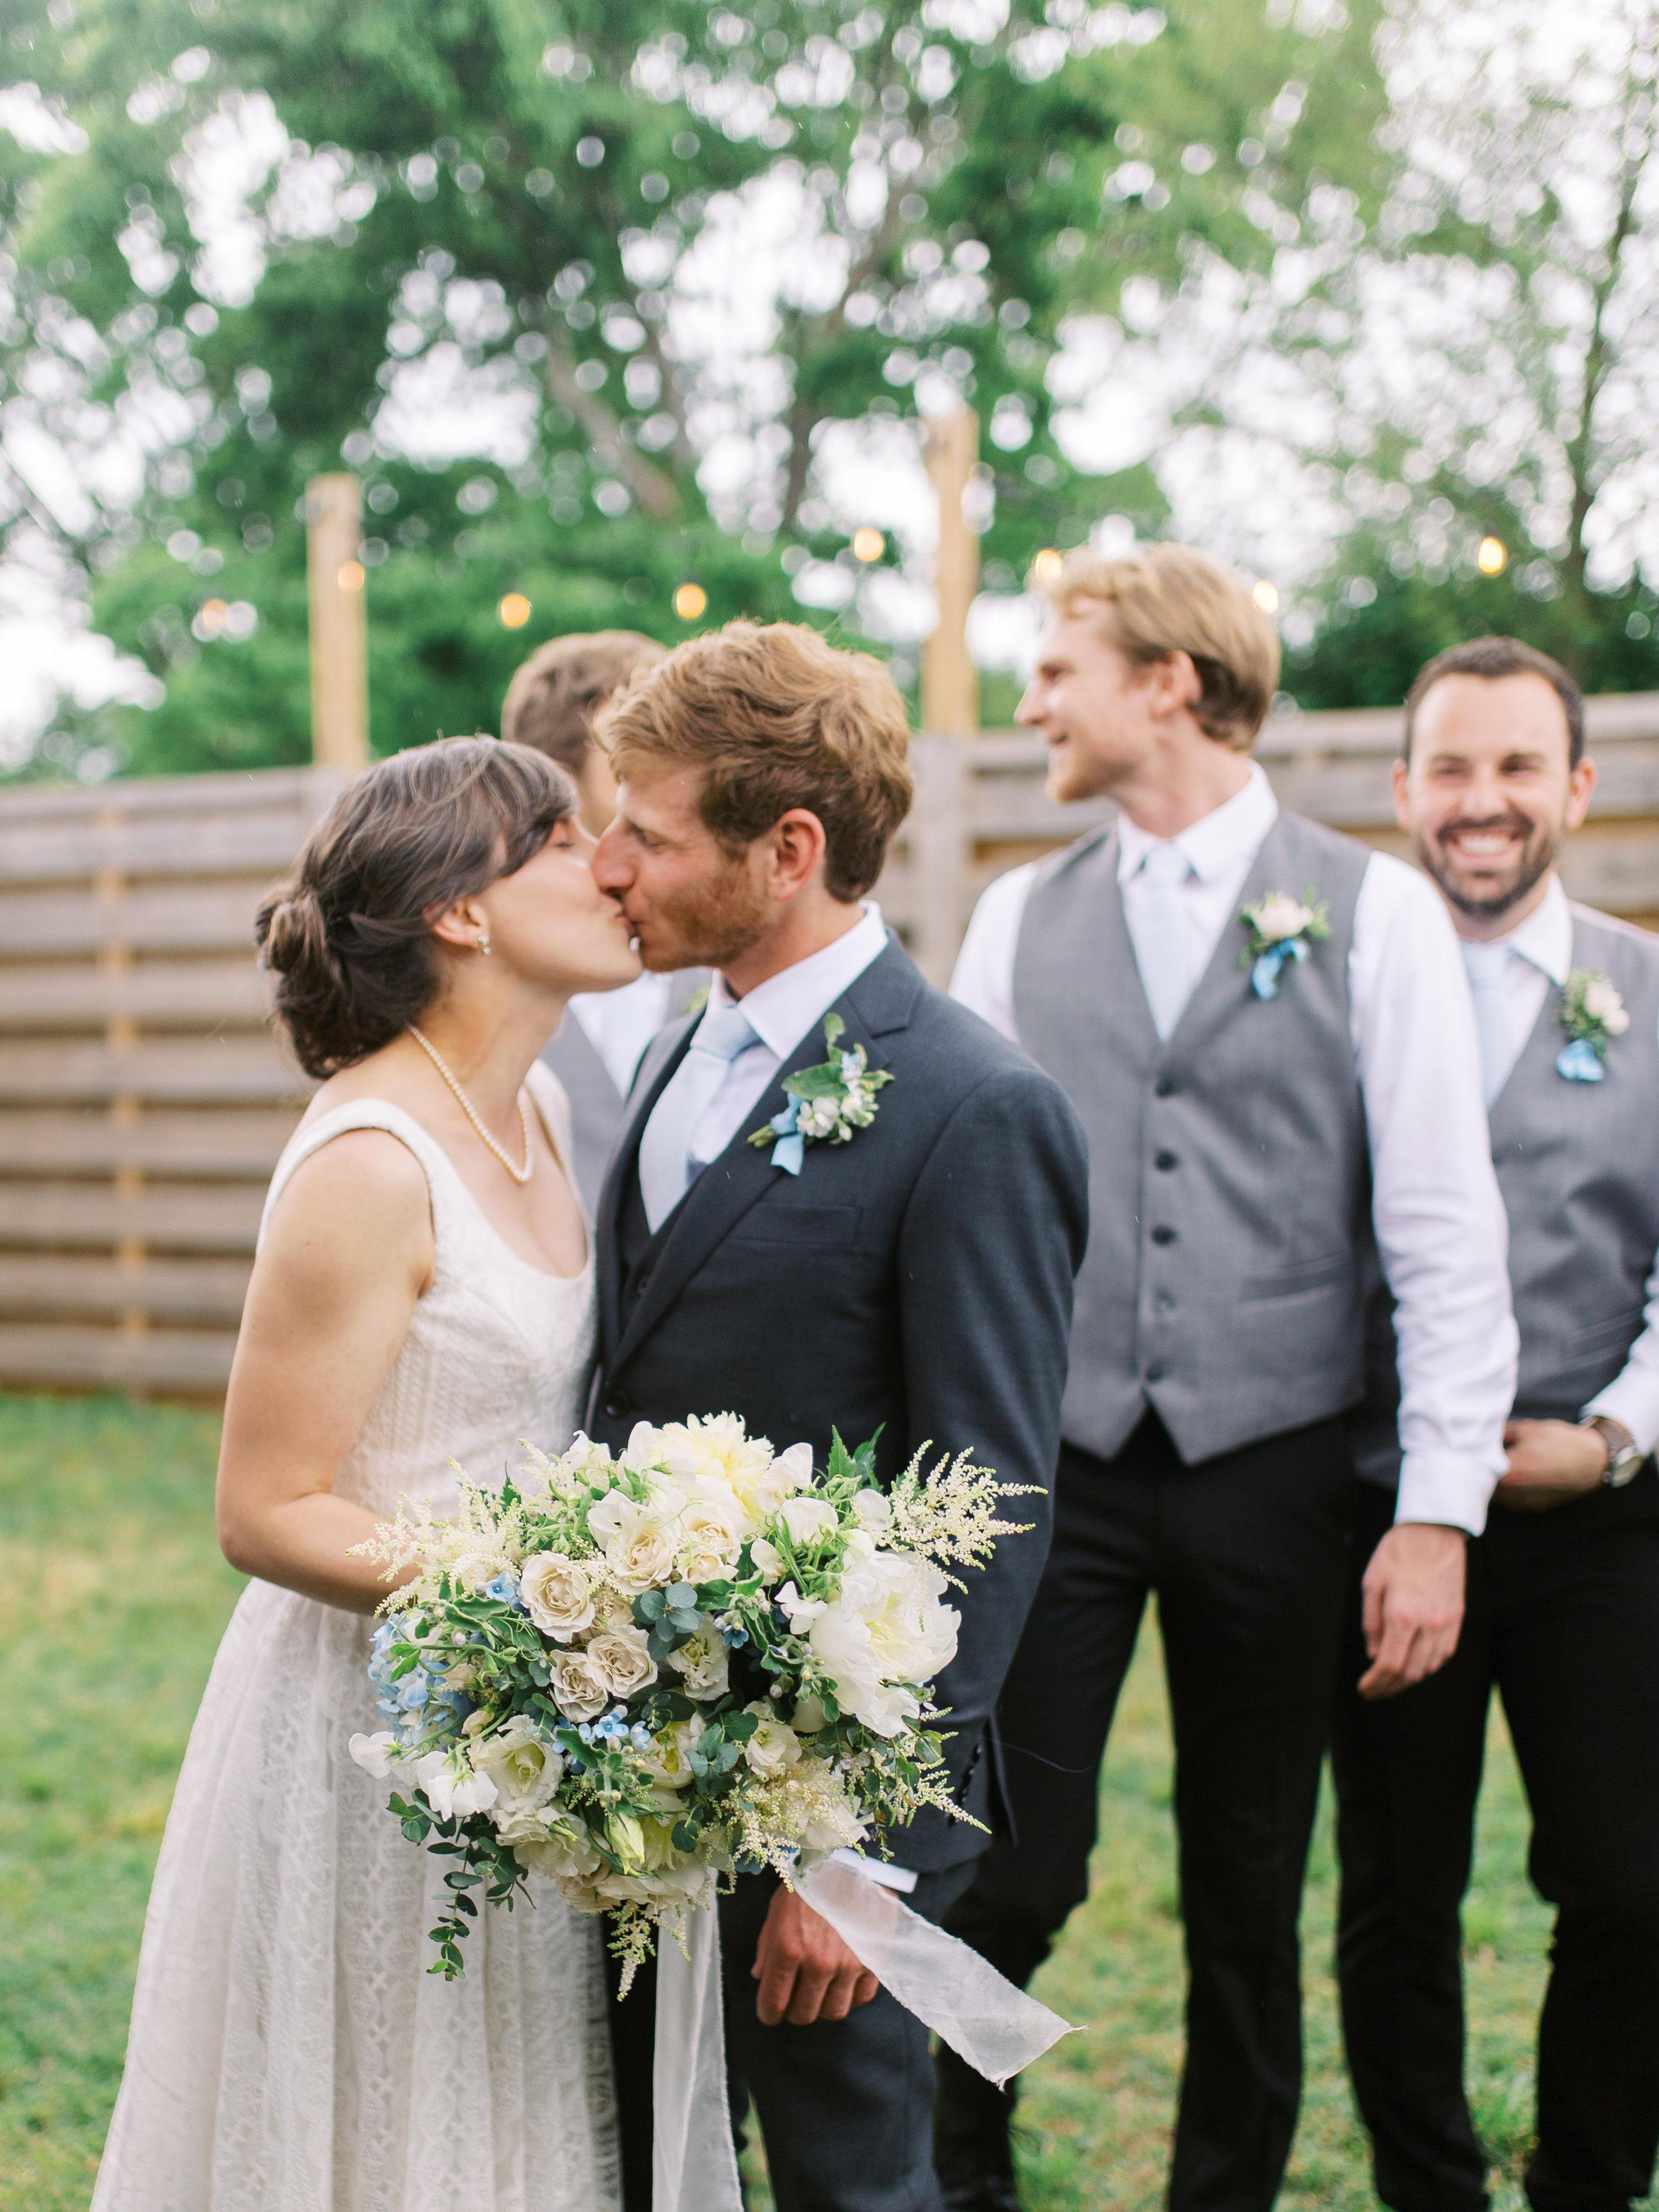 ellis+keith-wedding-155.jpg